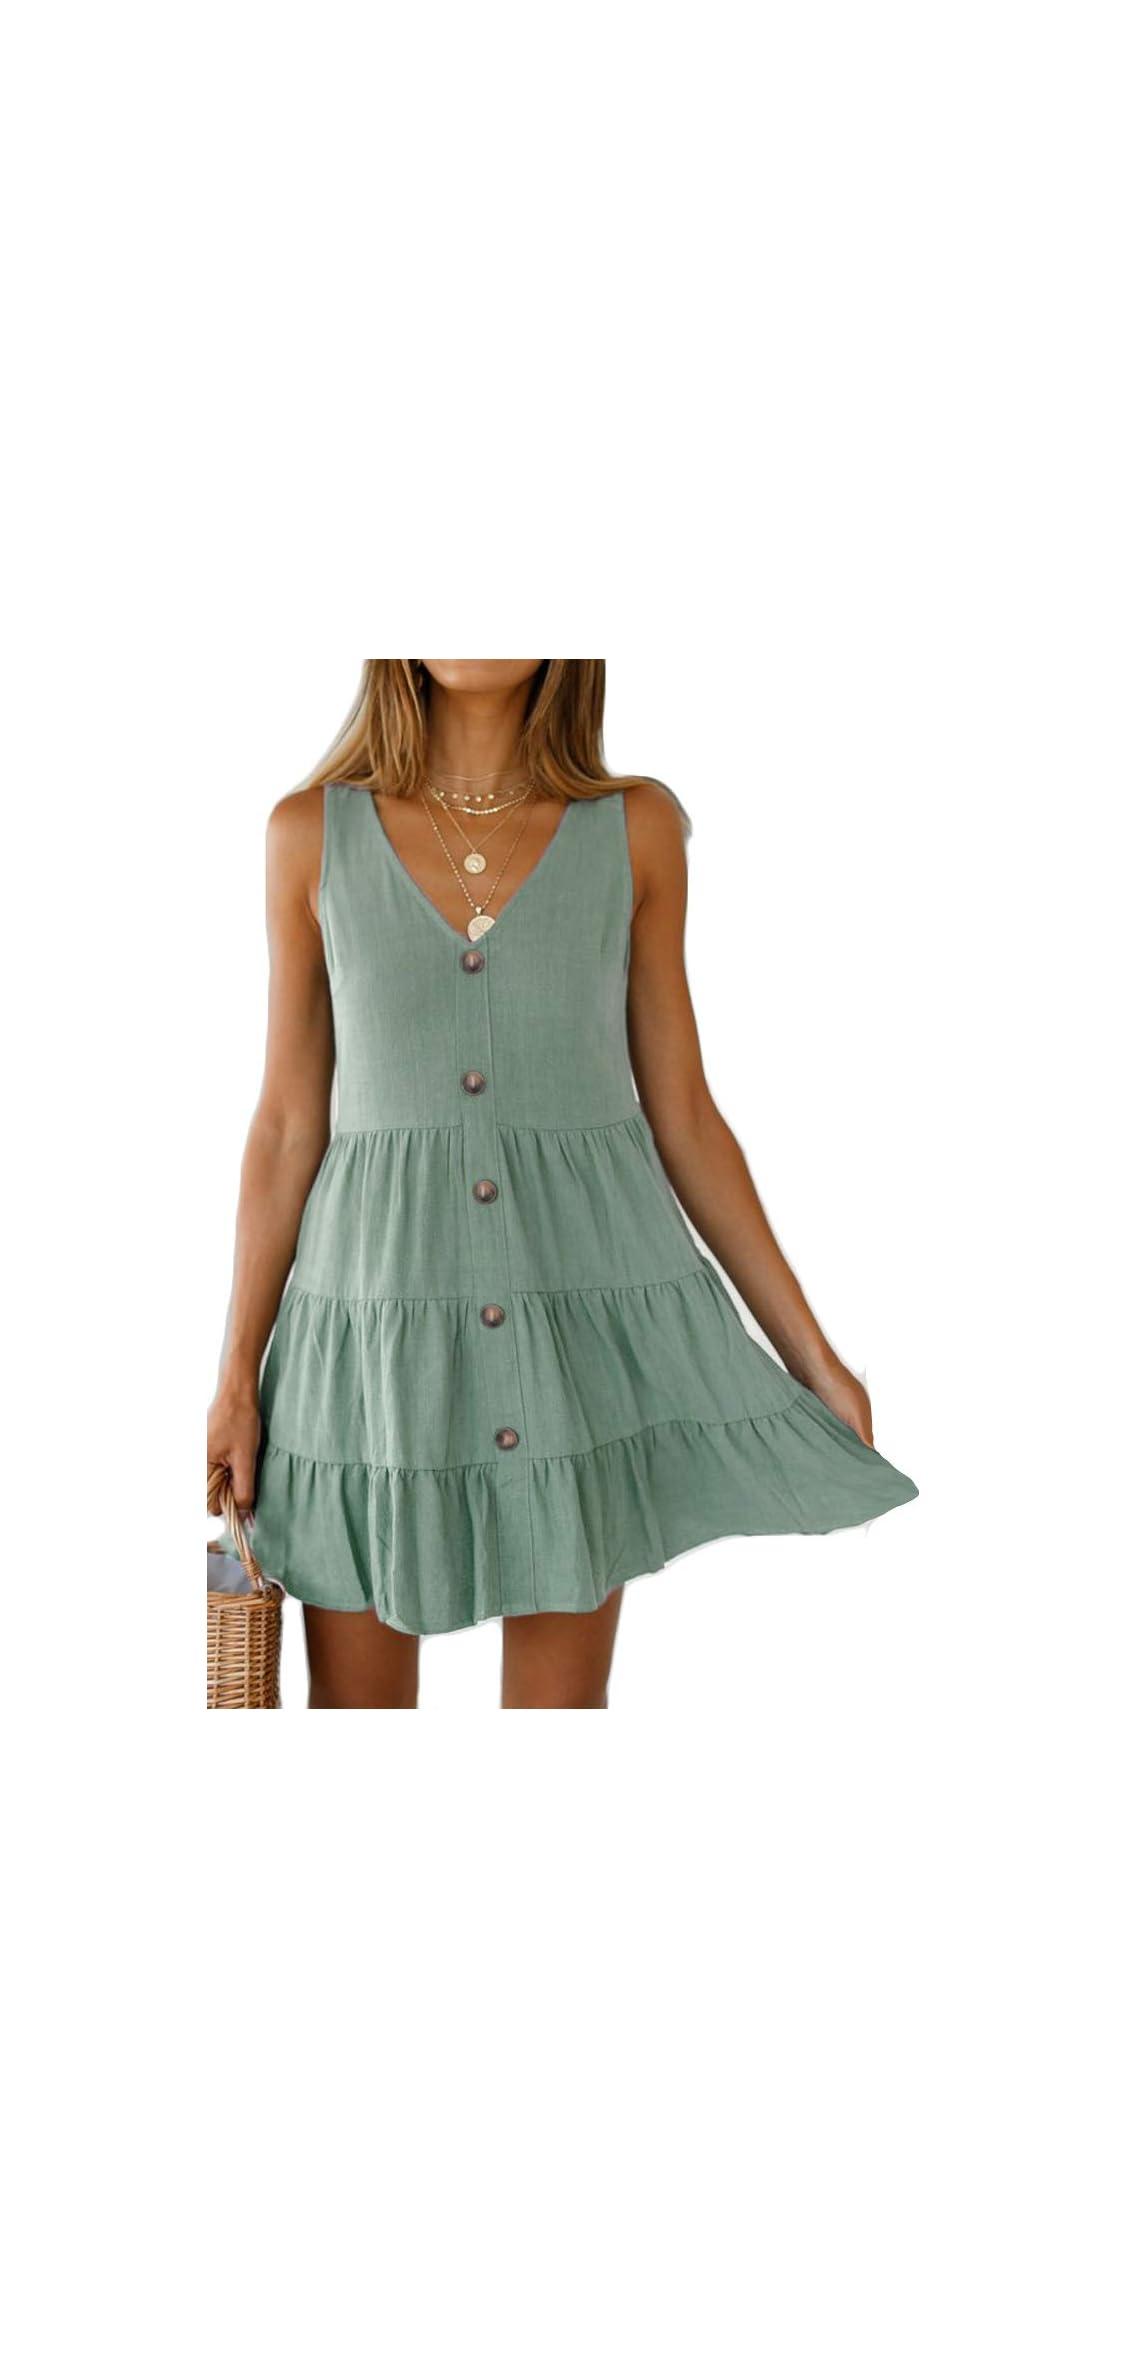 Women's Button Front Dress Summer Sleeveless V-neck Swing